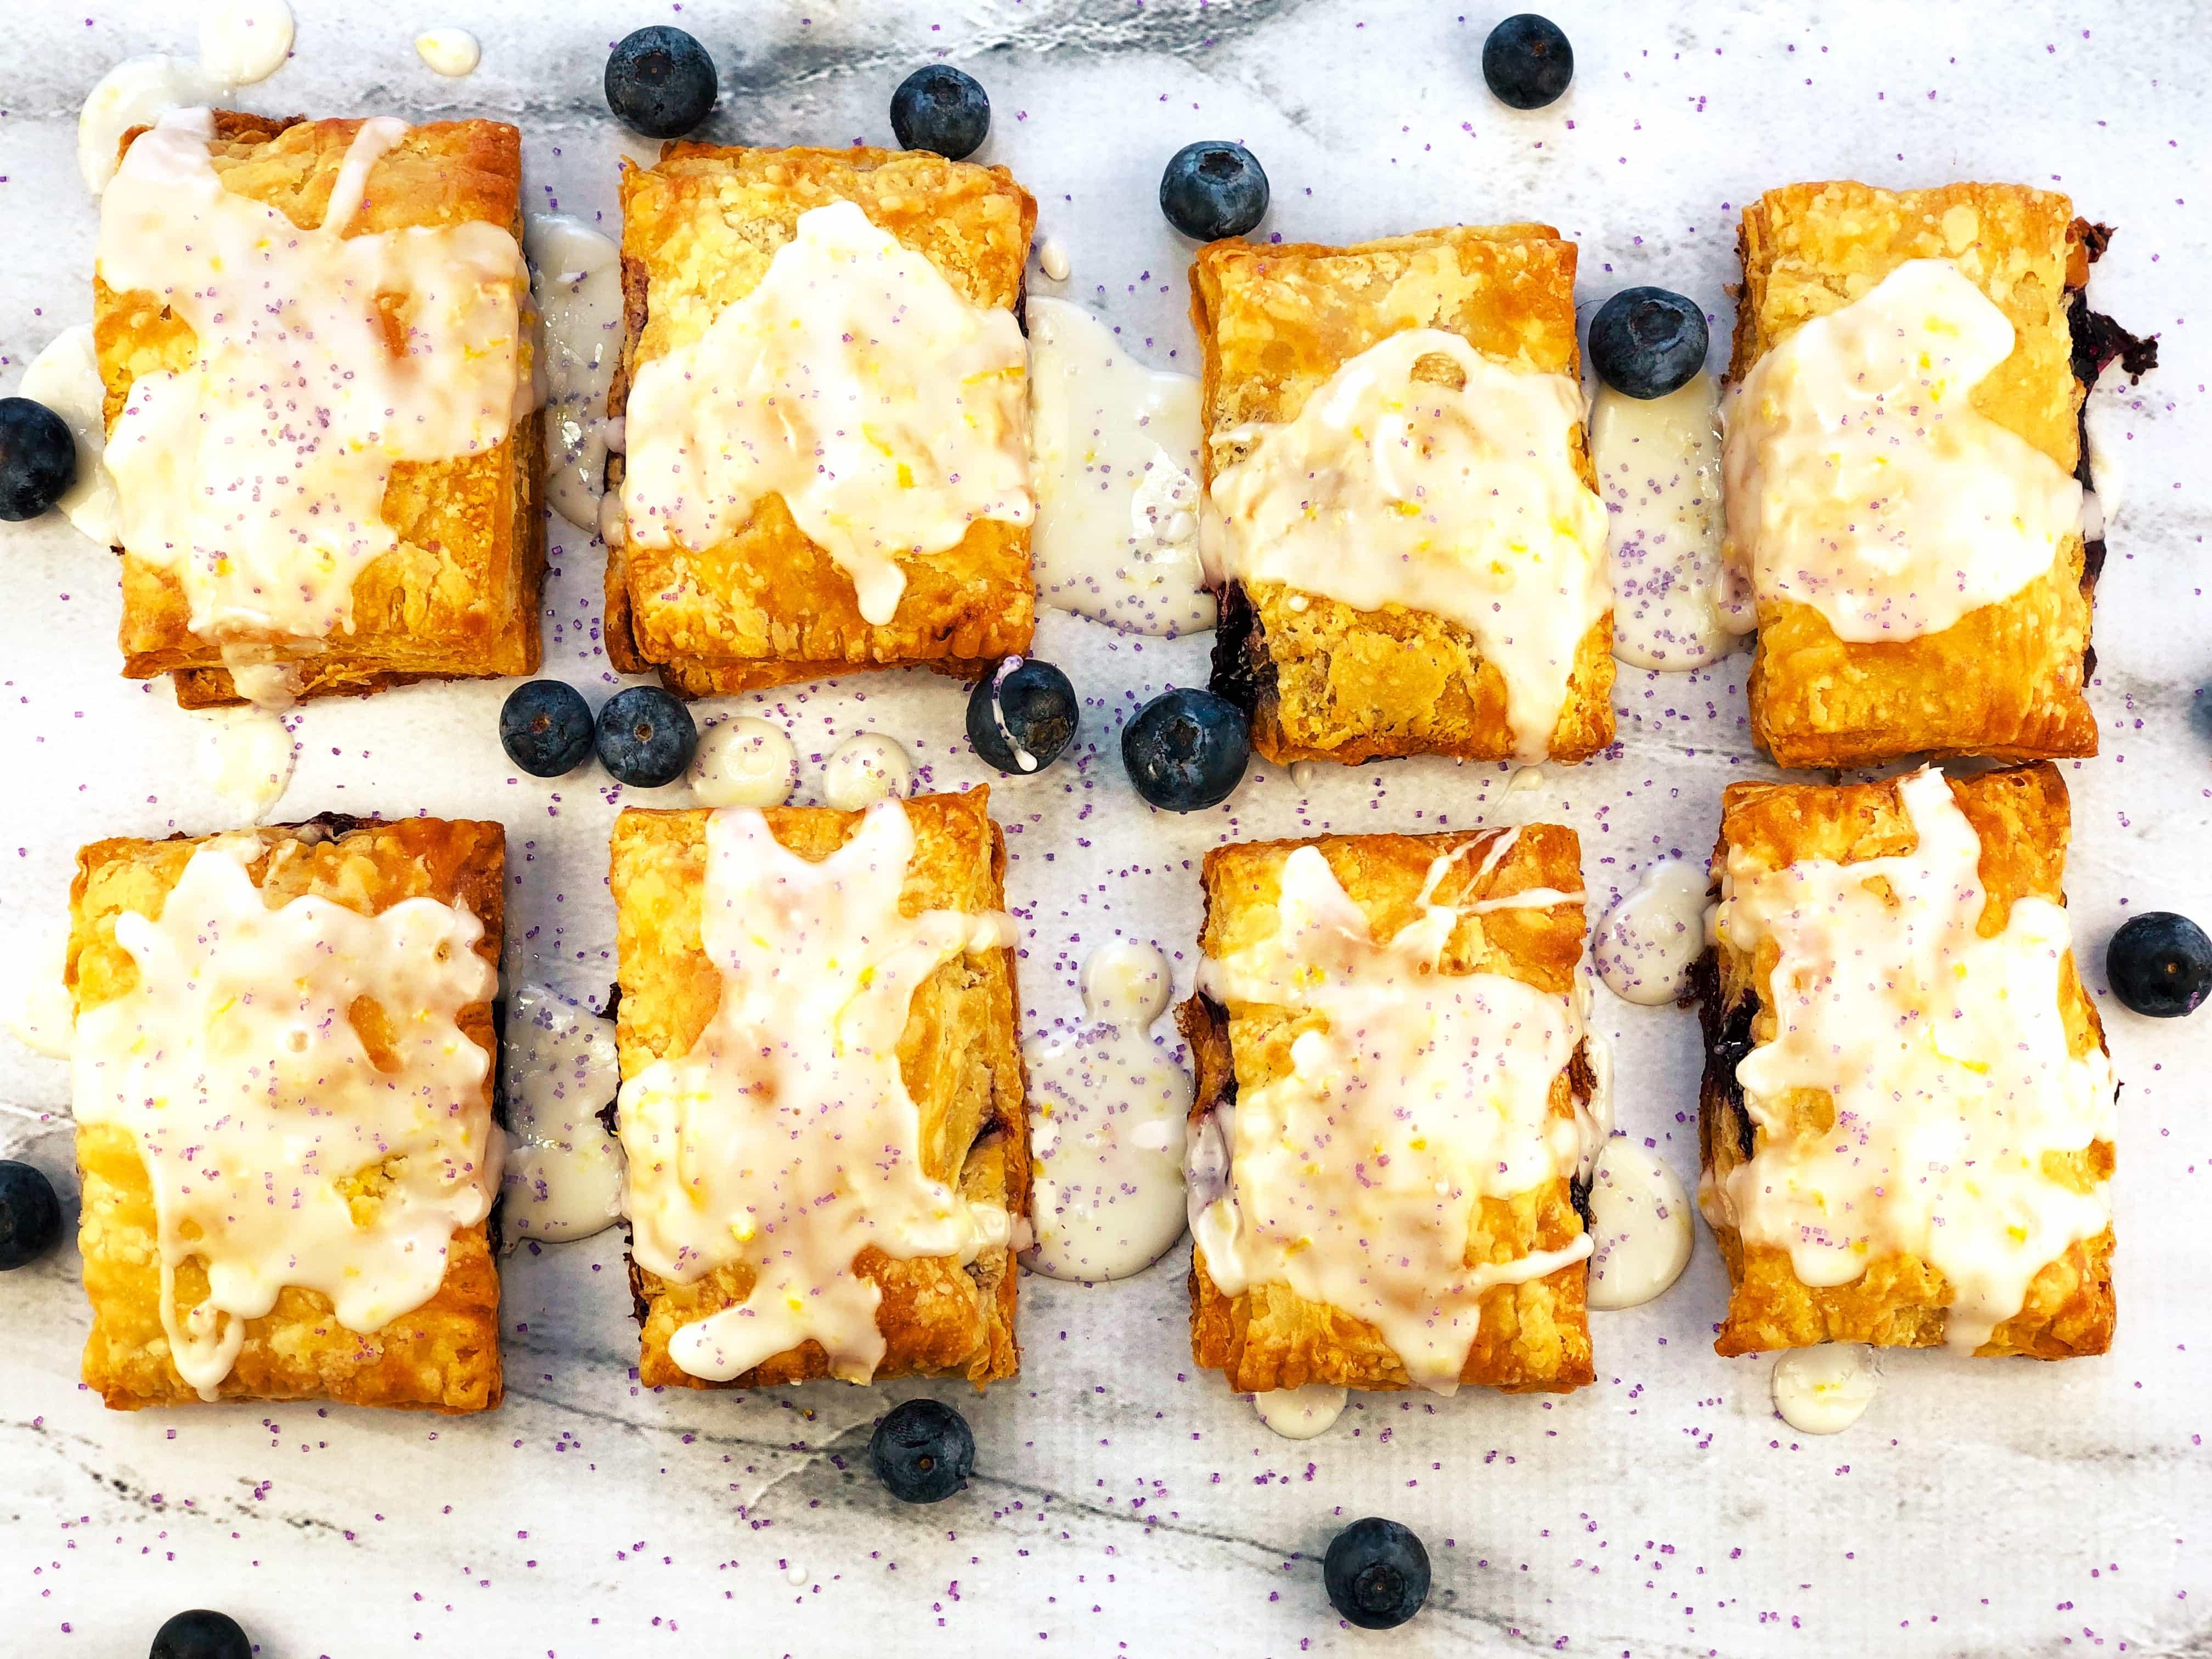 Blueberry Lemon Hand Pies